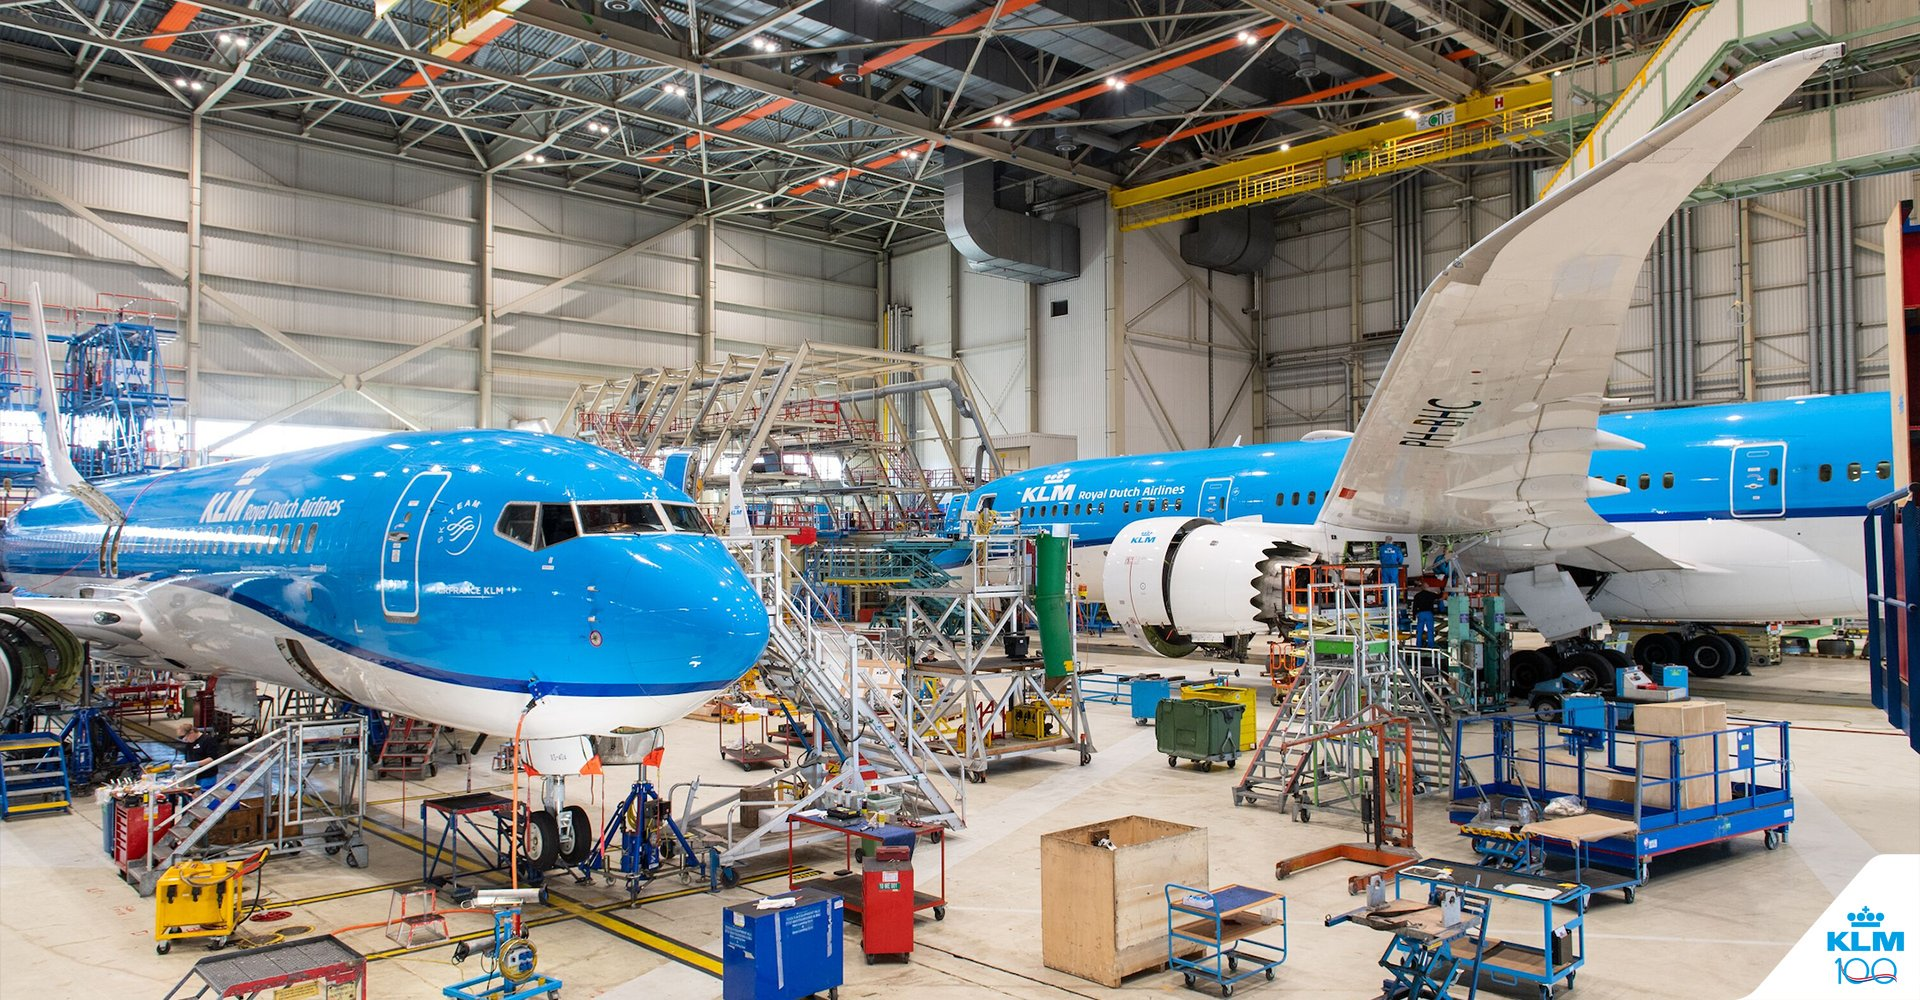 Aerolínea holandesa KLM llega por primera vez a Liberia, Costa Rica